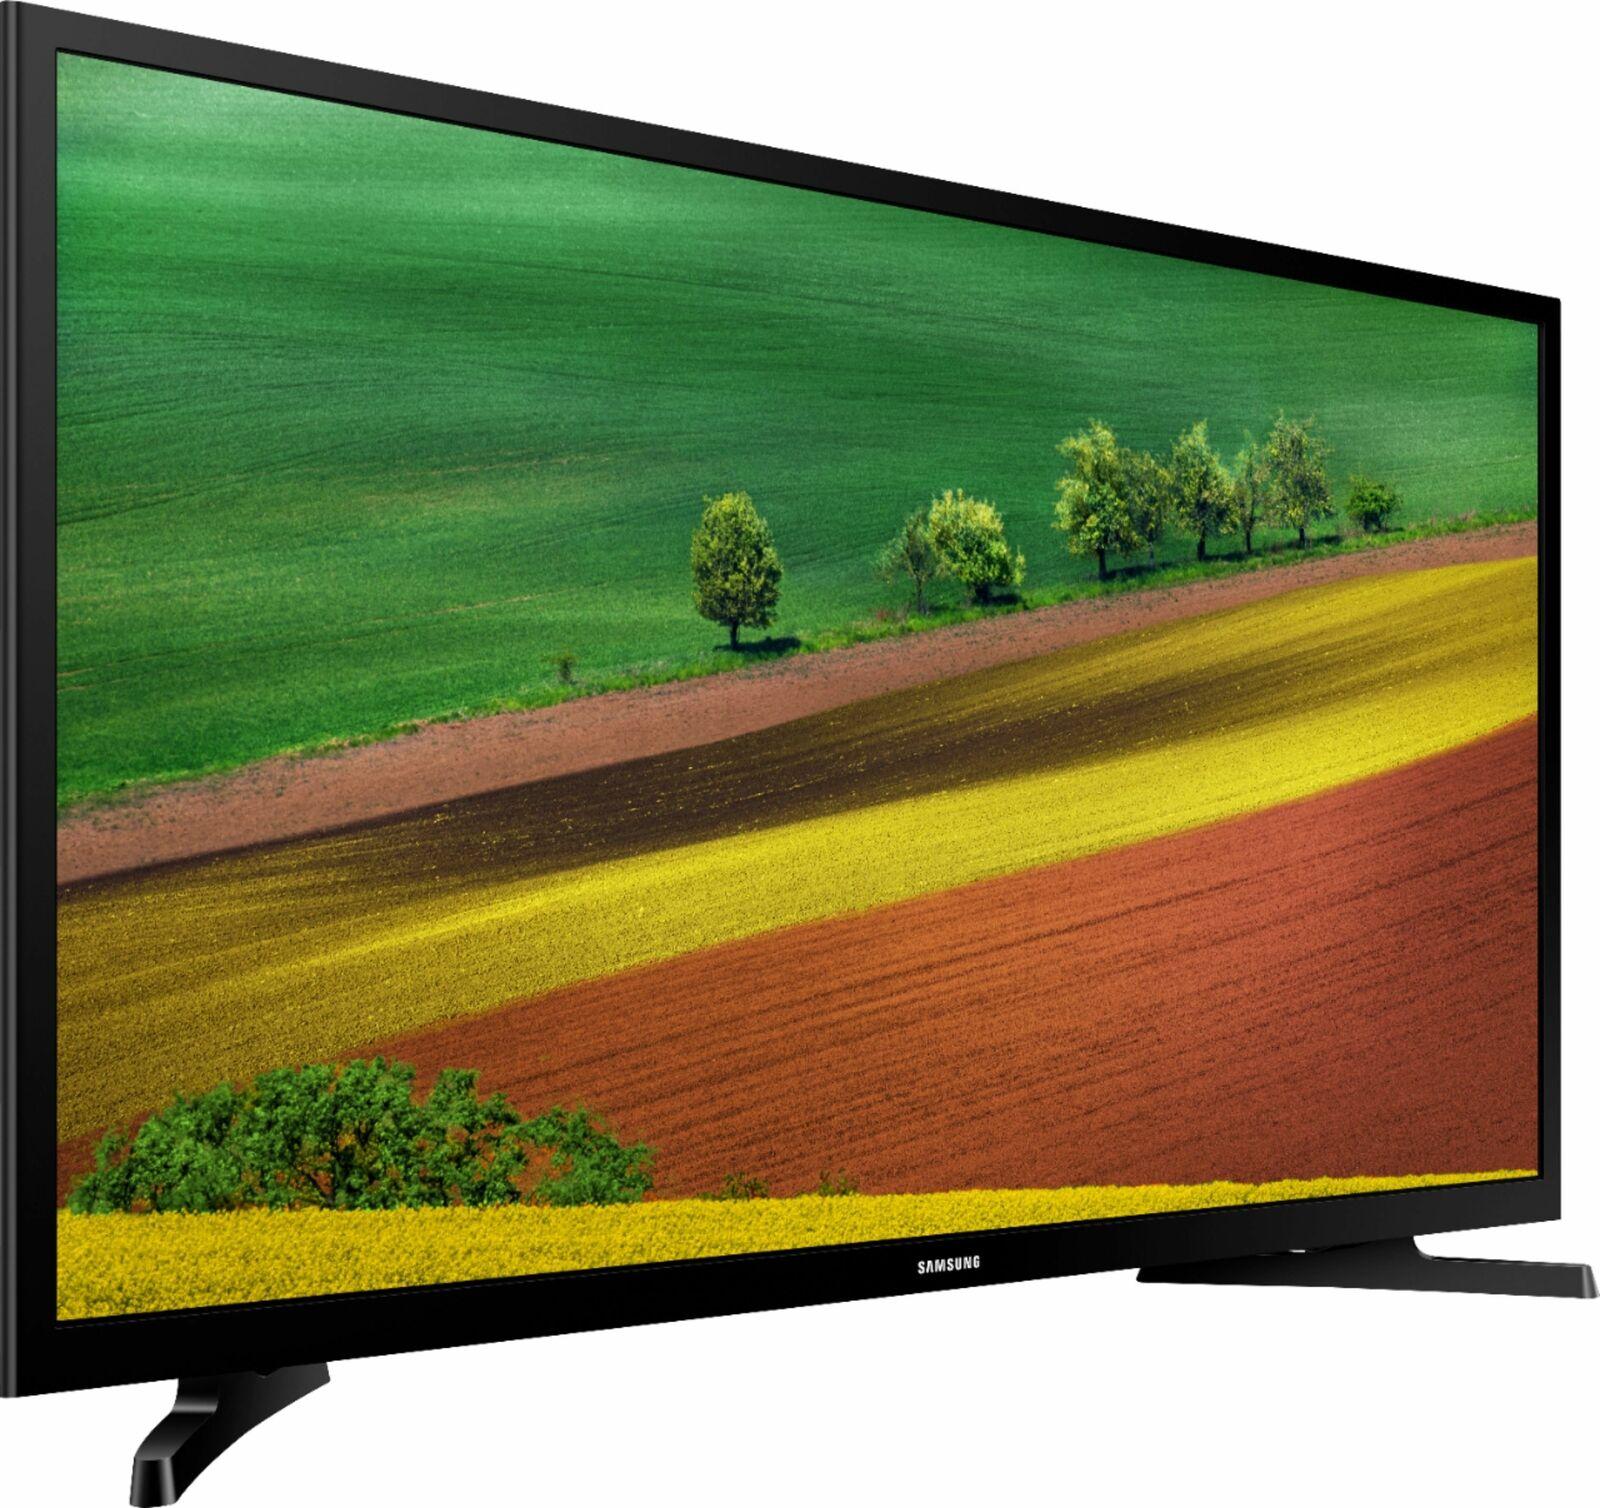 Samsung 32 inch 720p Class LED M4500 Series Smart HDTV